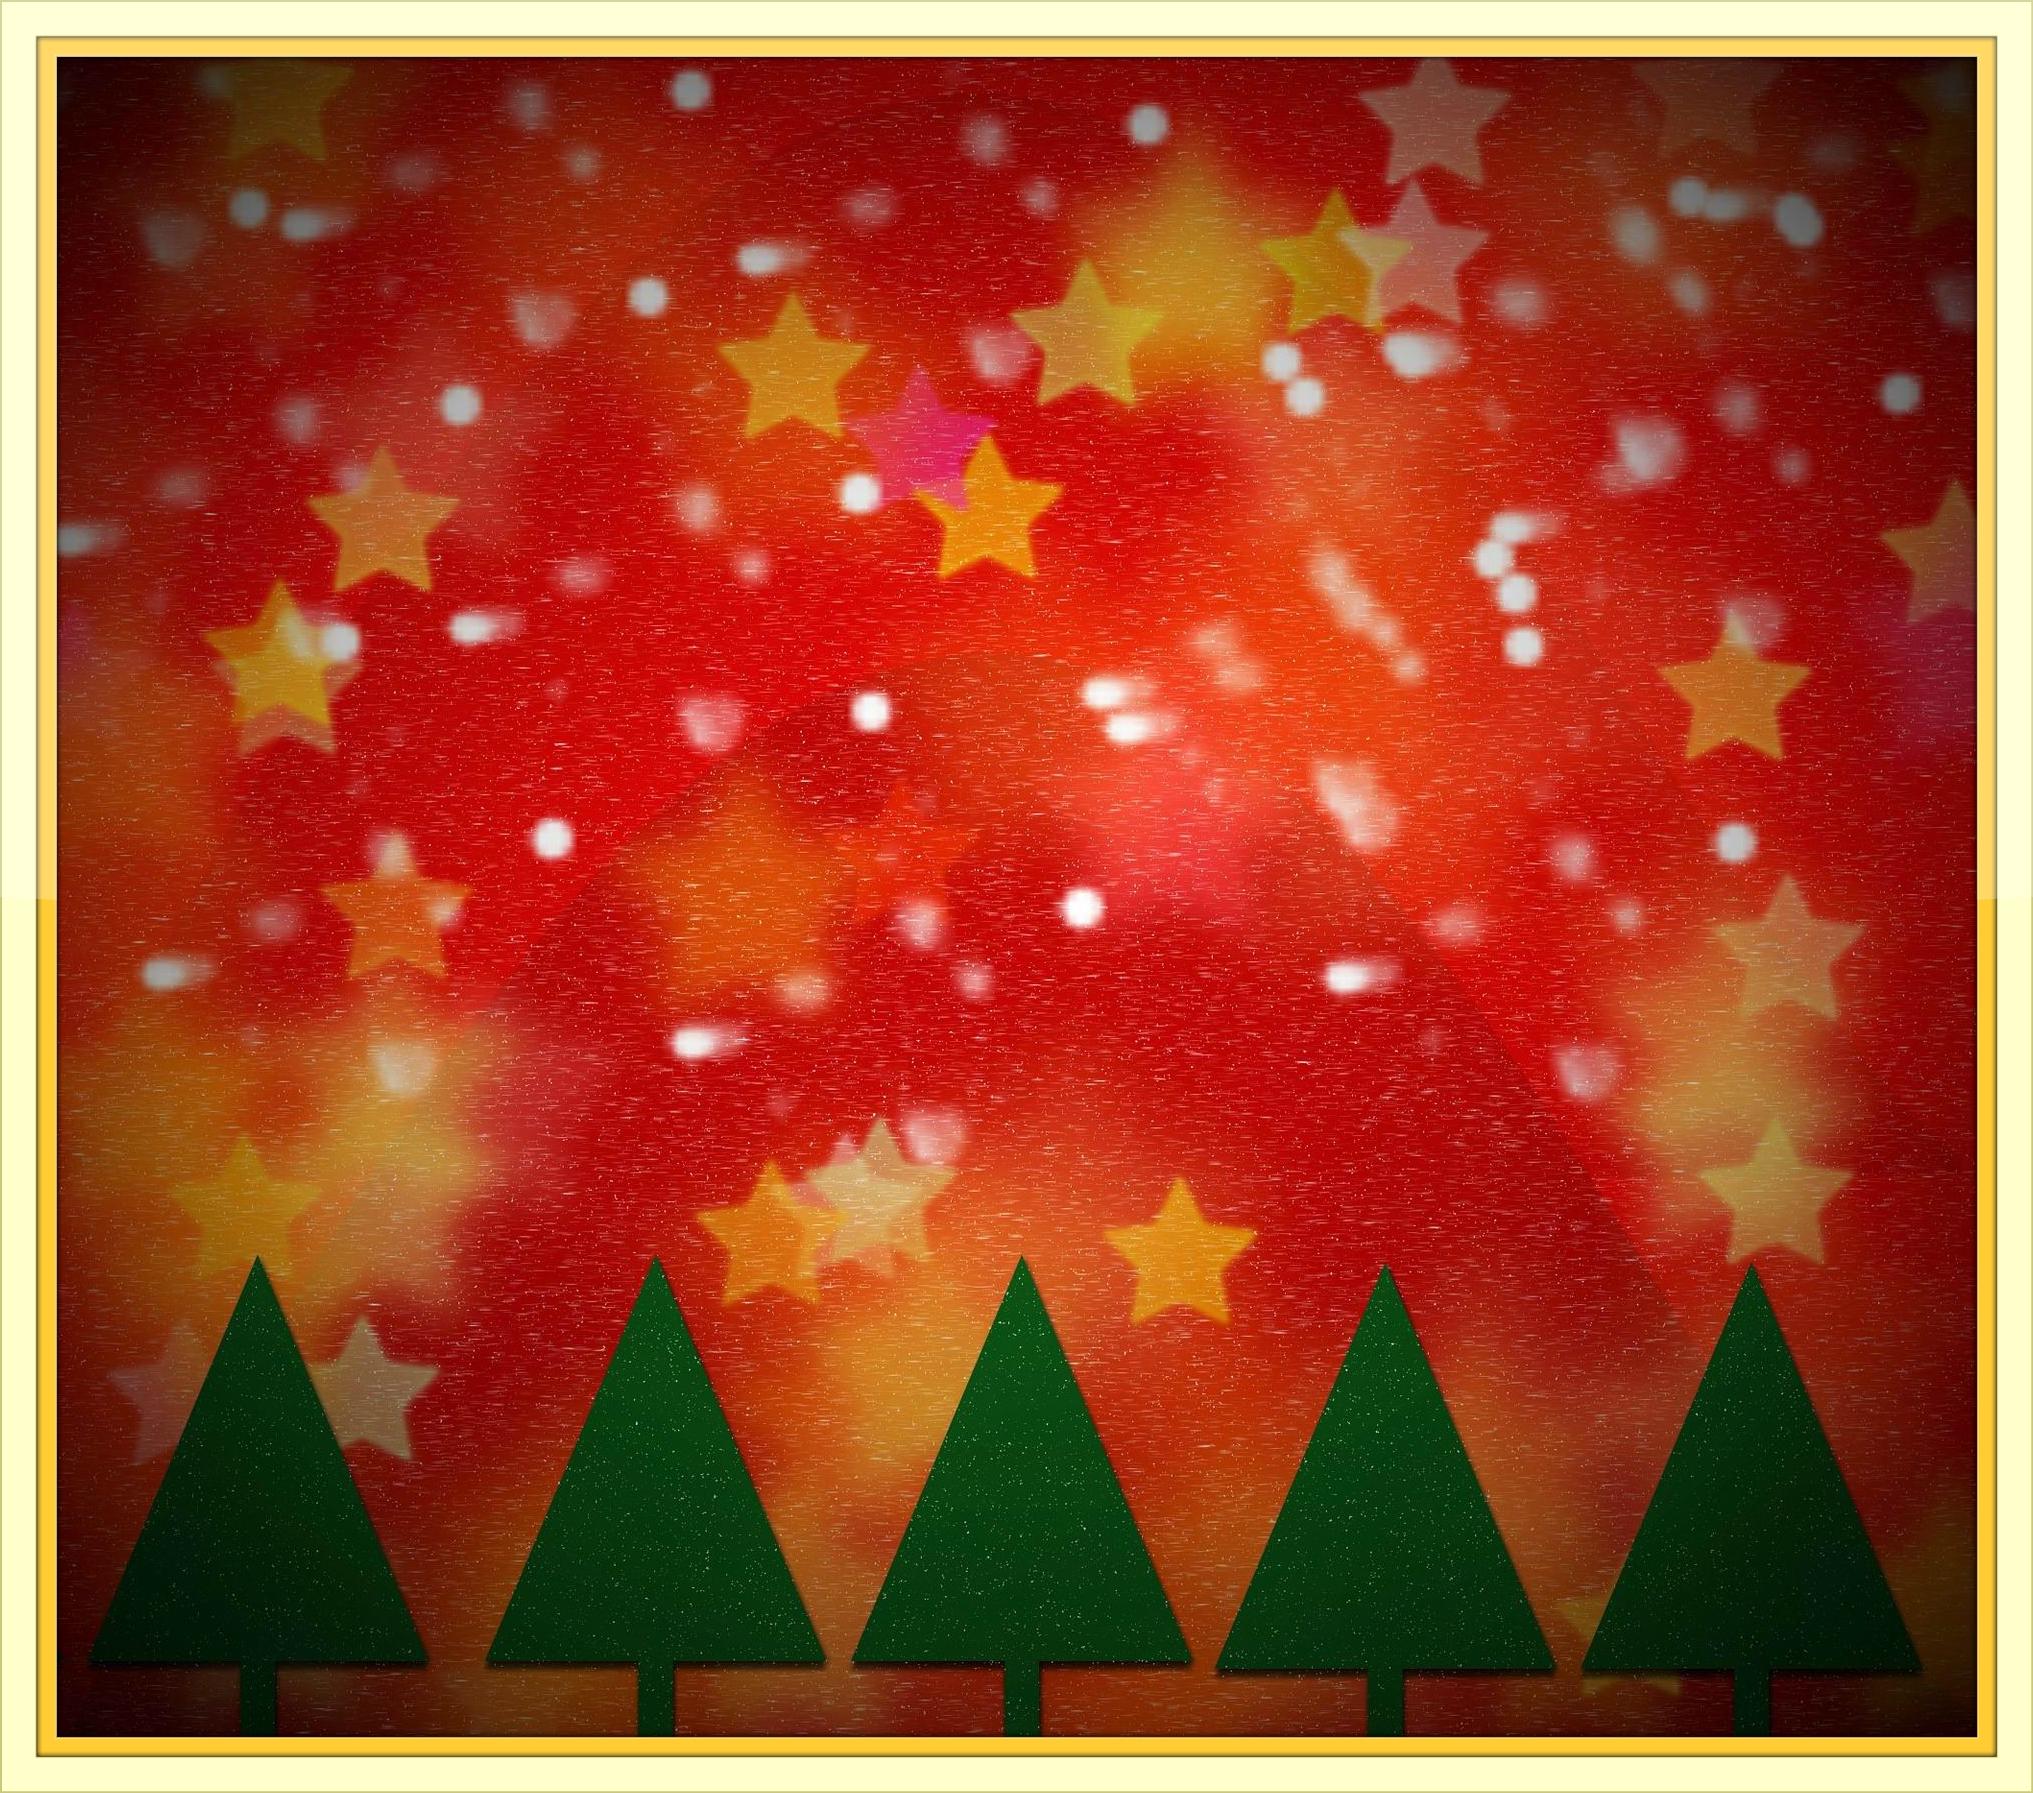 CHRISTMAS TREES - RED STAR BACKGROUND - Kalhh -- PX - framed